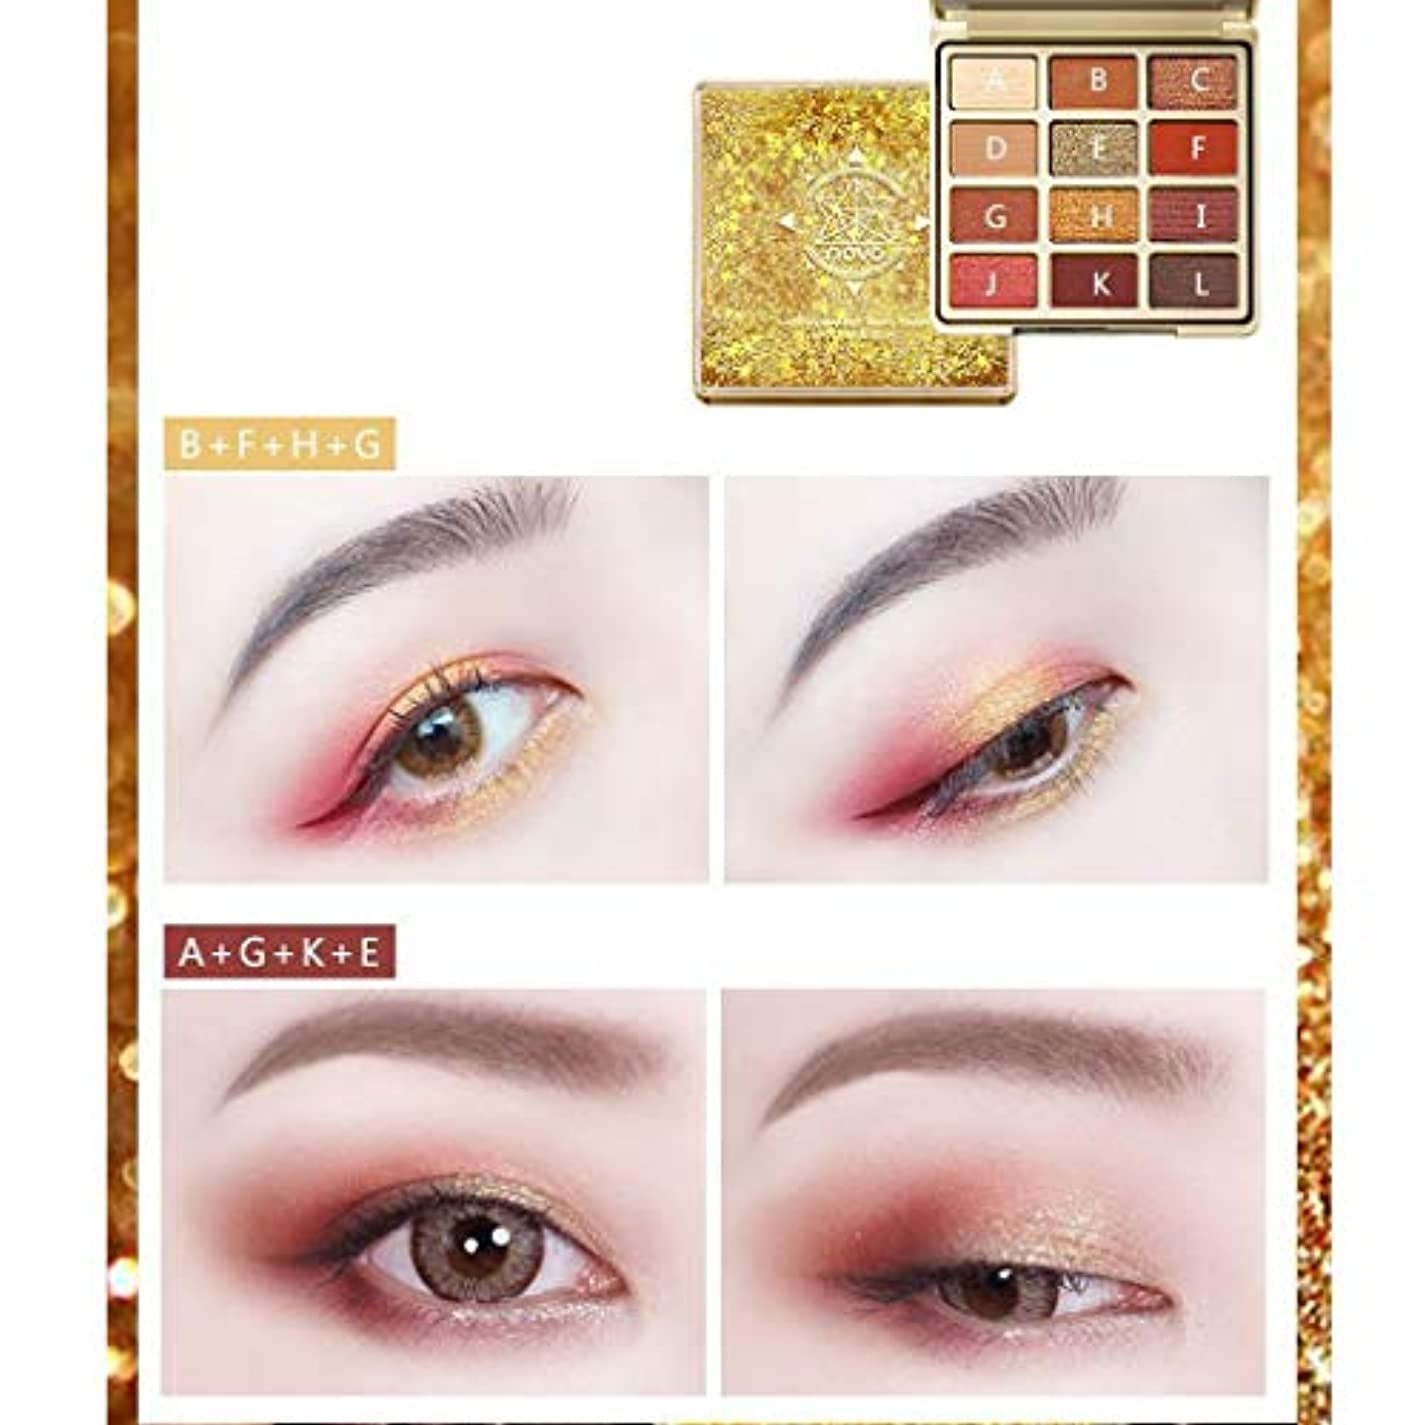 Akane アイシャドウパレット Novo ファッション INS 人気 超綺麗 美しい キラキラ 優雅な 防水 魅力的 高級 可愛い 持ち便利 日常 Eye Shadow (12色) 103